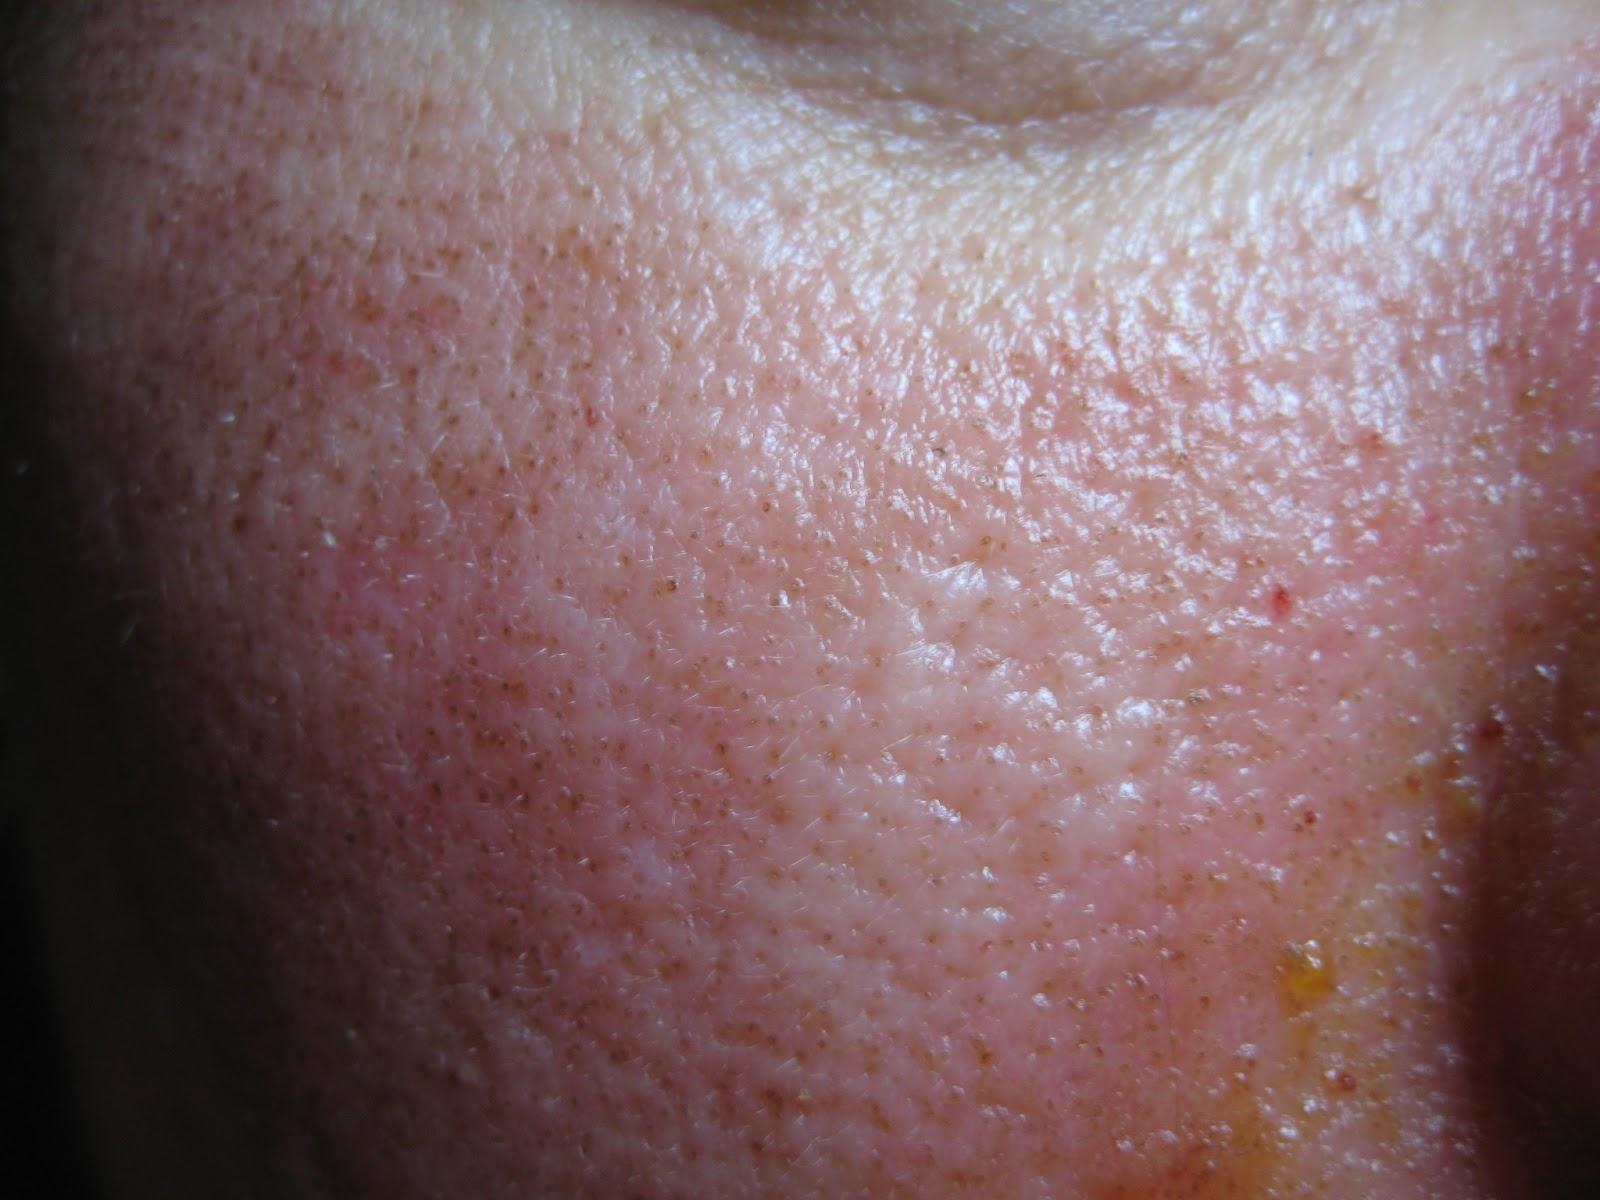 intraductalis papilloma okozza